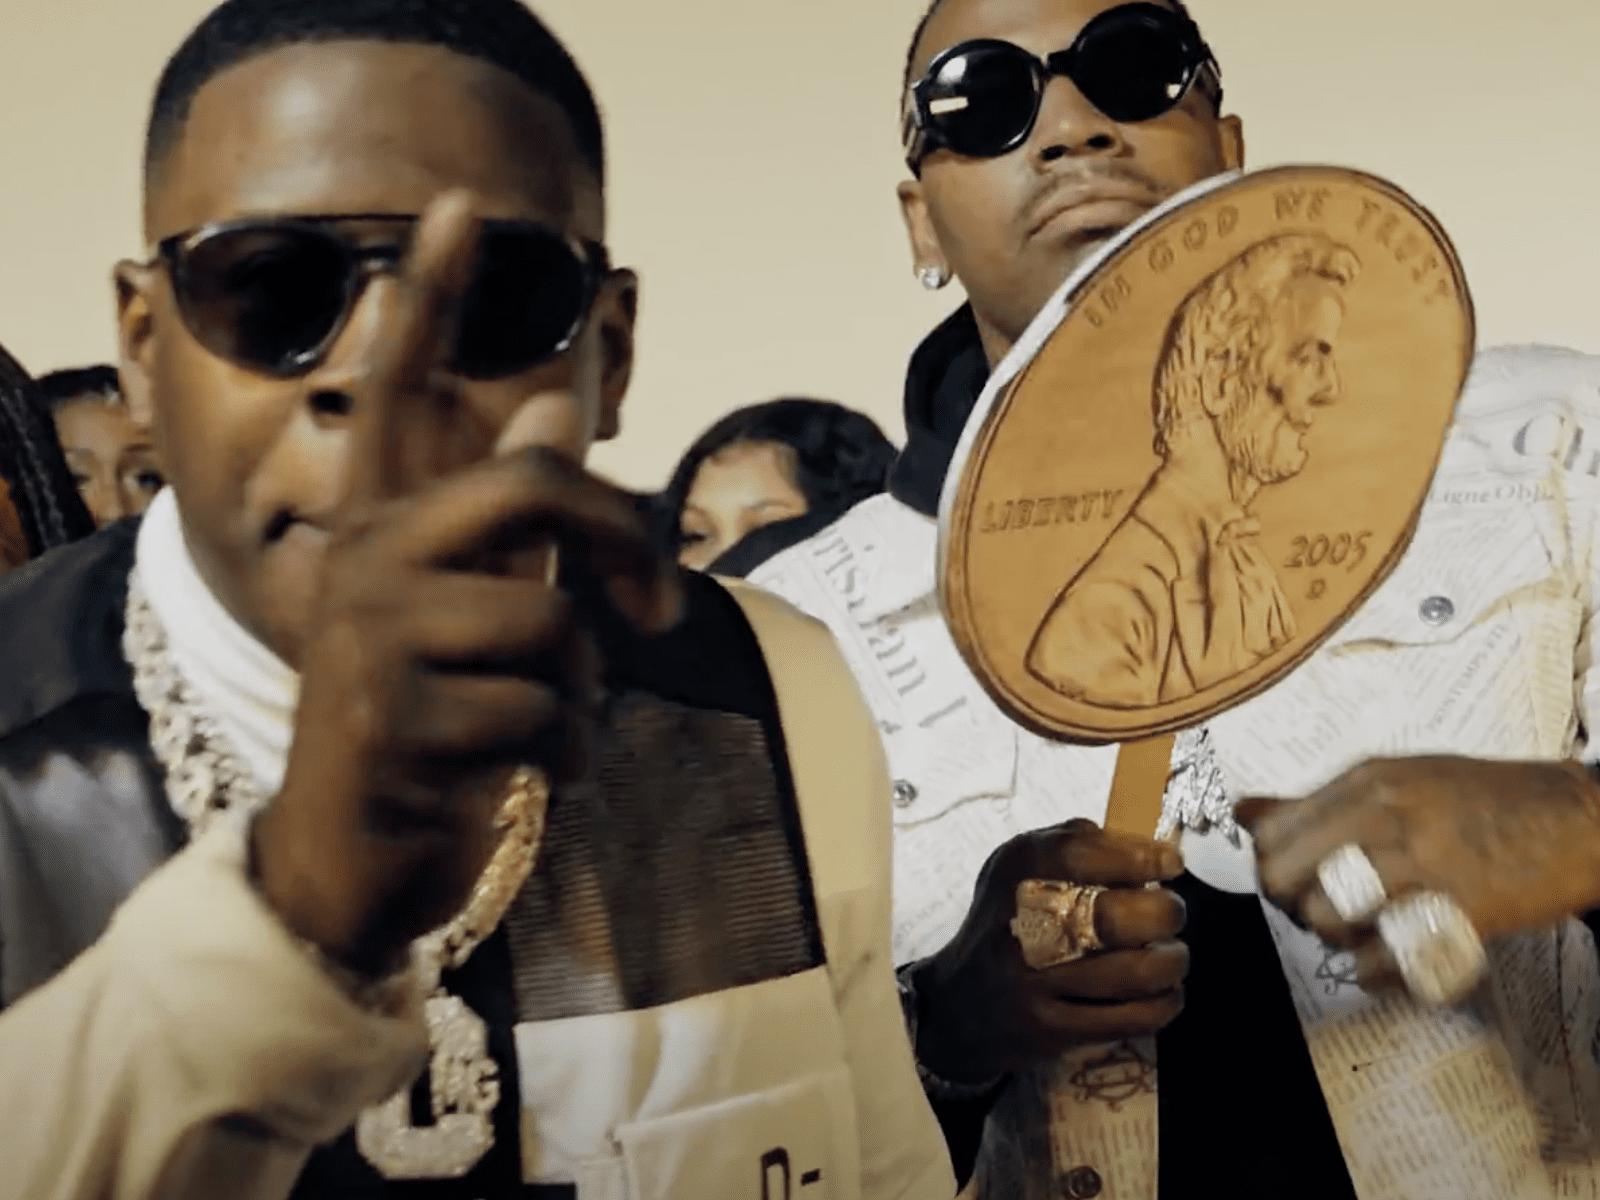 Moneybagg Yo Blac Youngsta Video 6